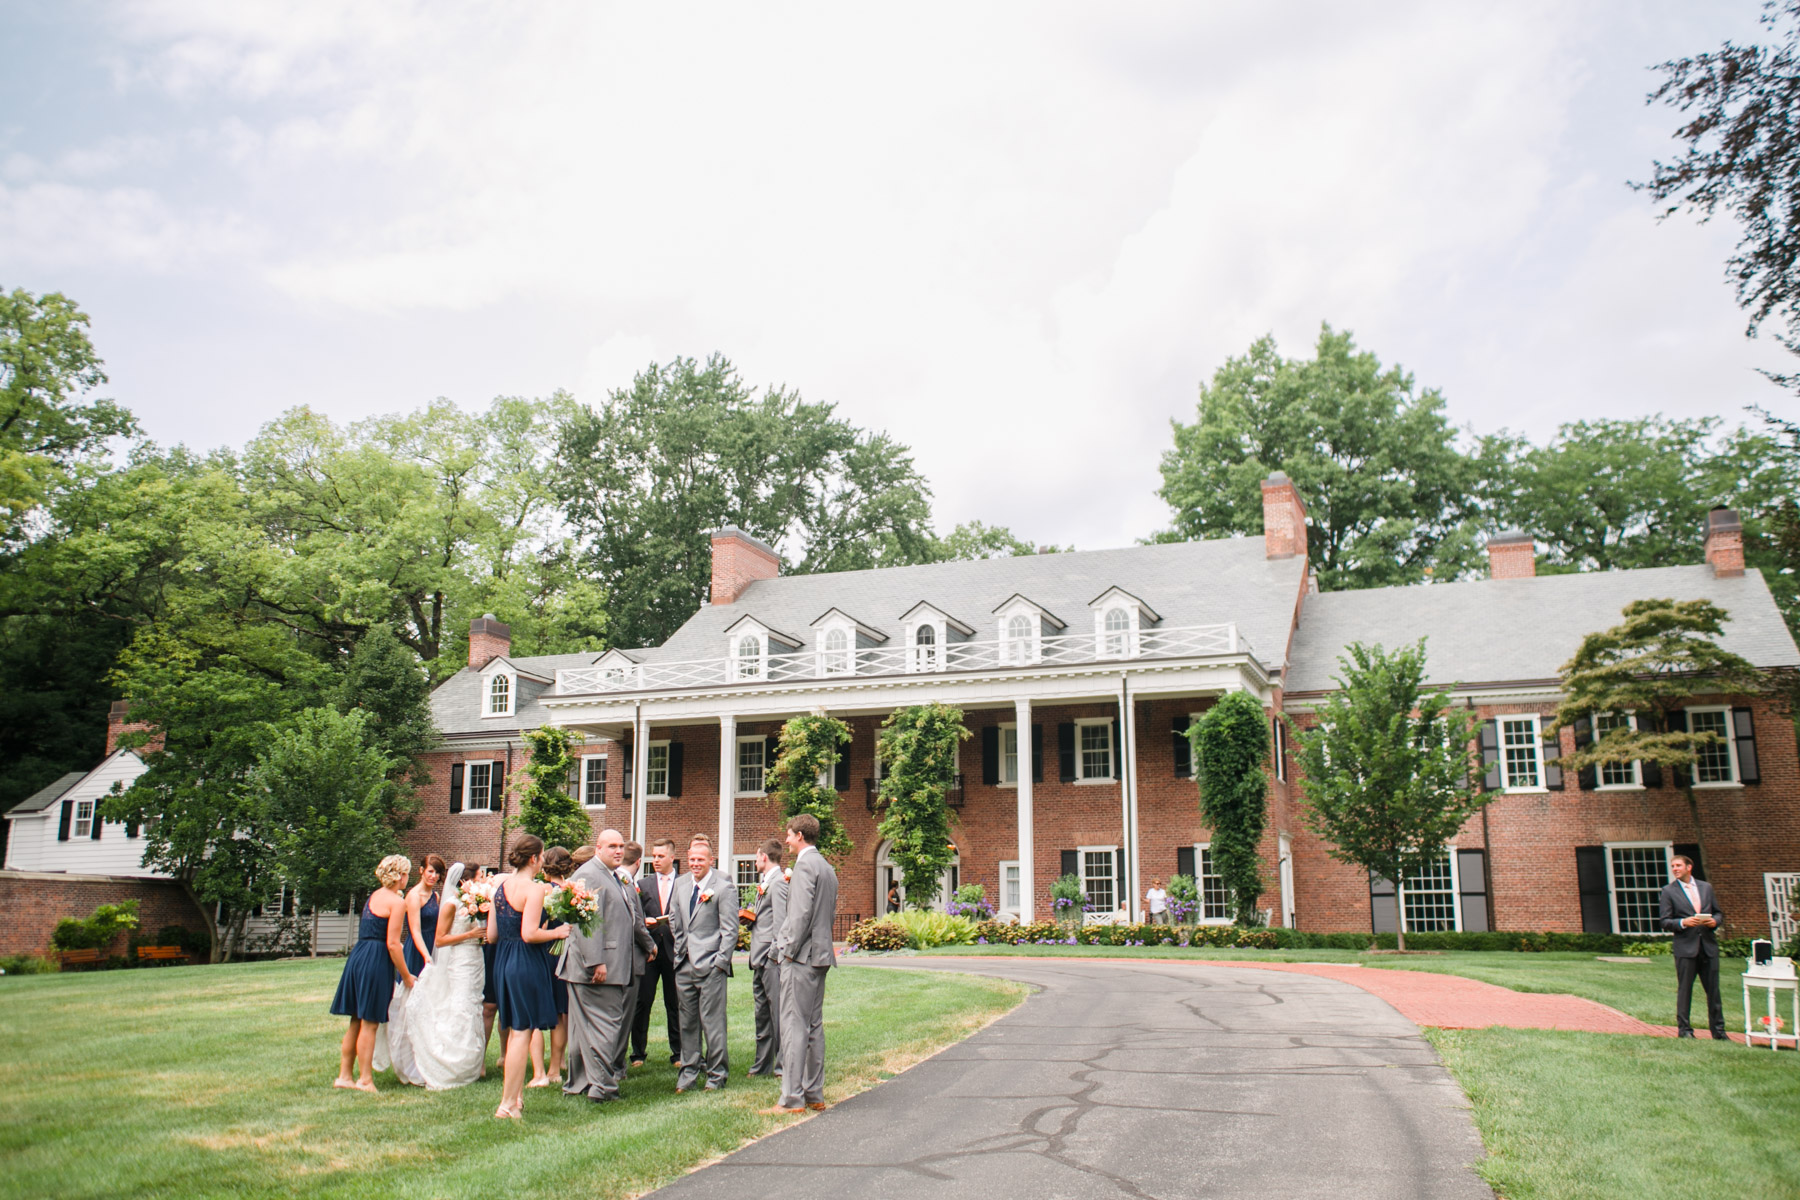 wildwood-park-wedding-photos-32.jpg